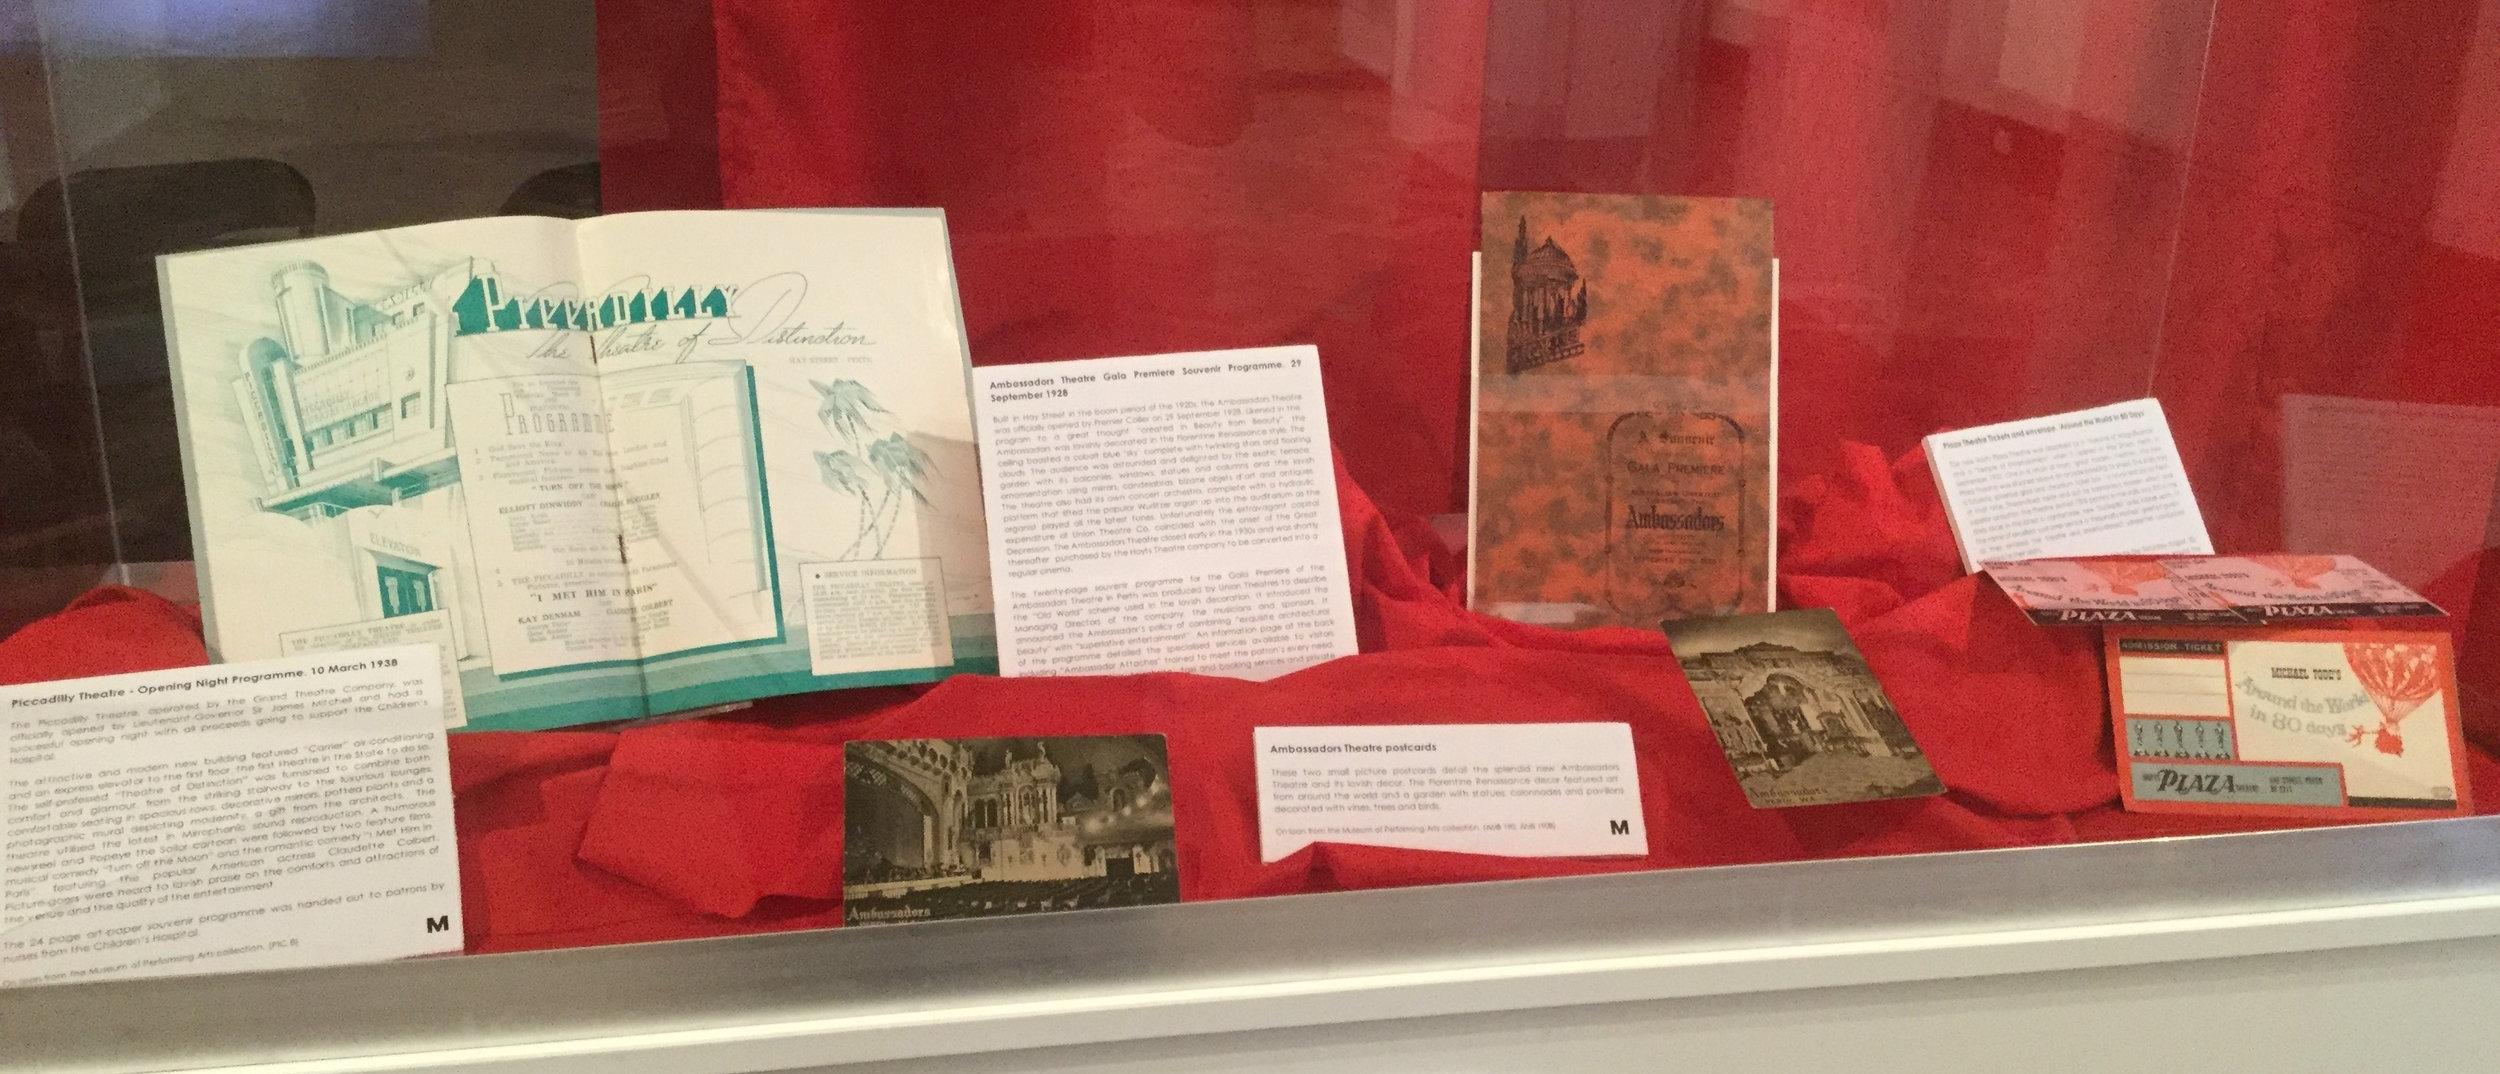 Historical memorabilia of Perth's theatres